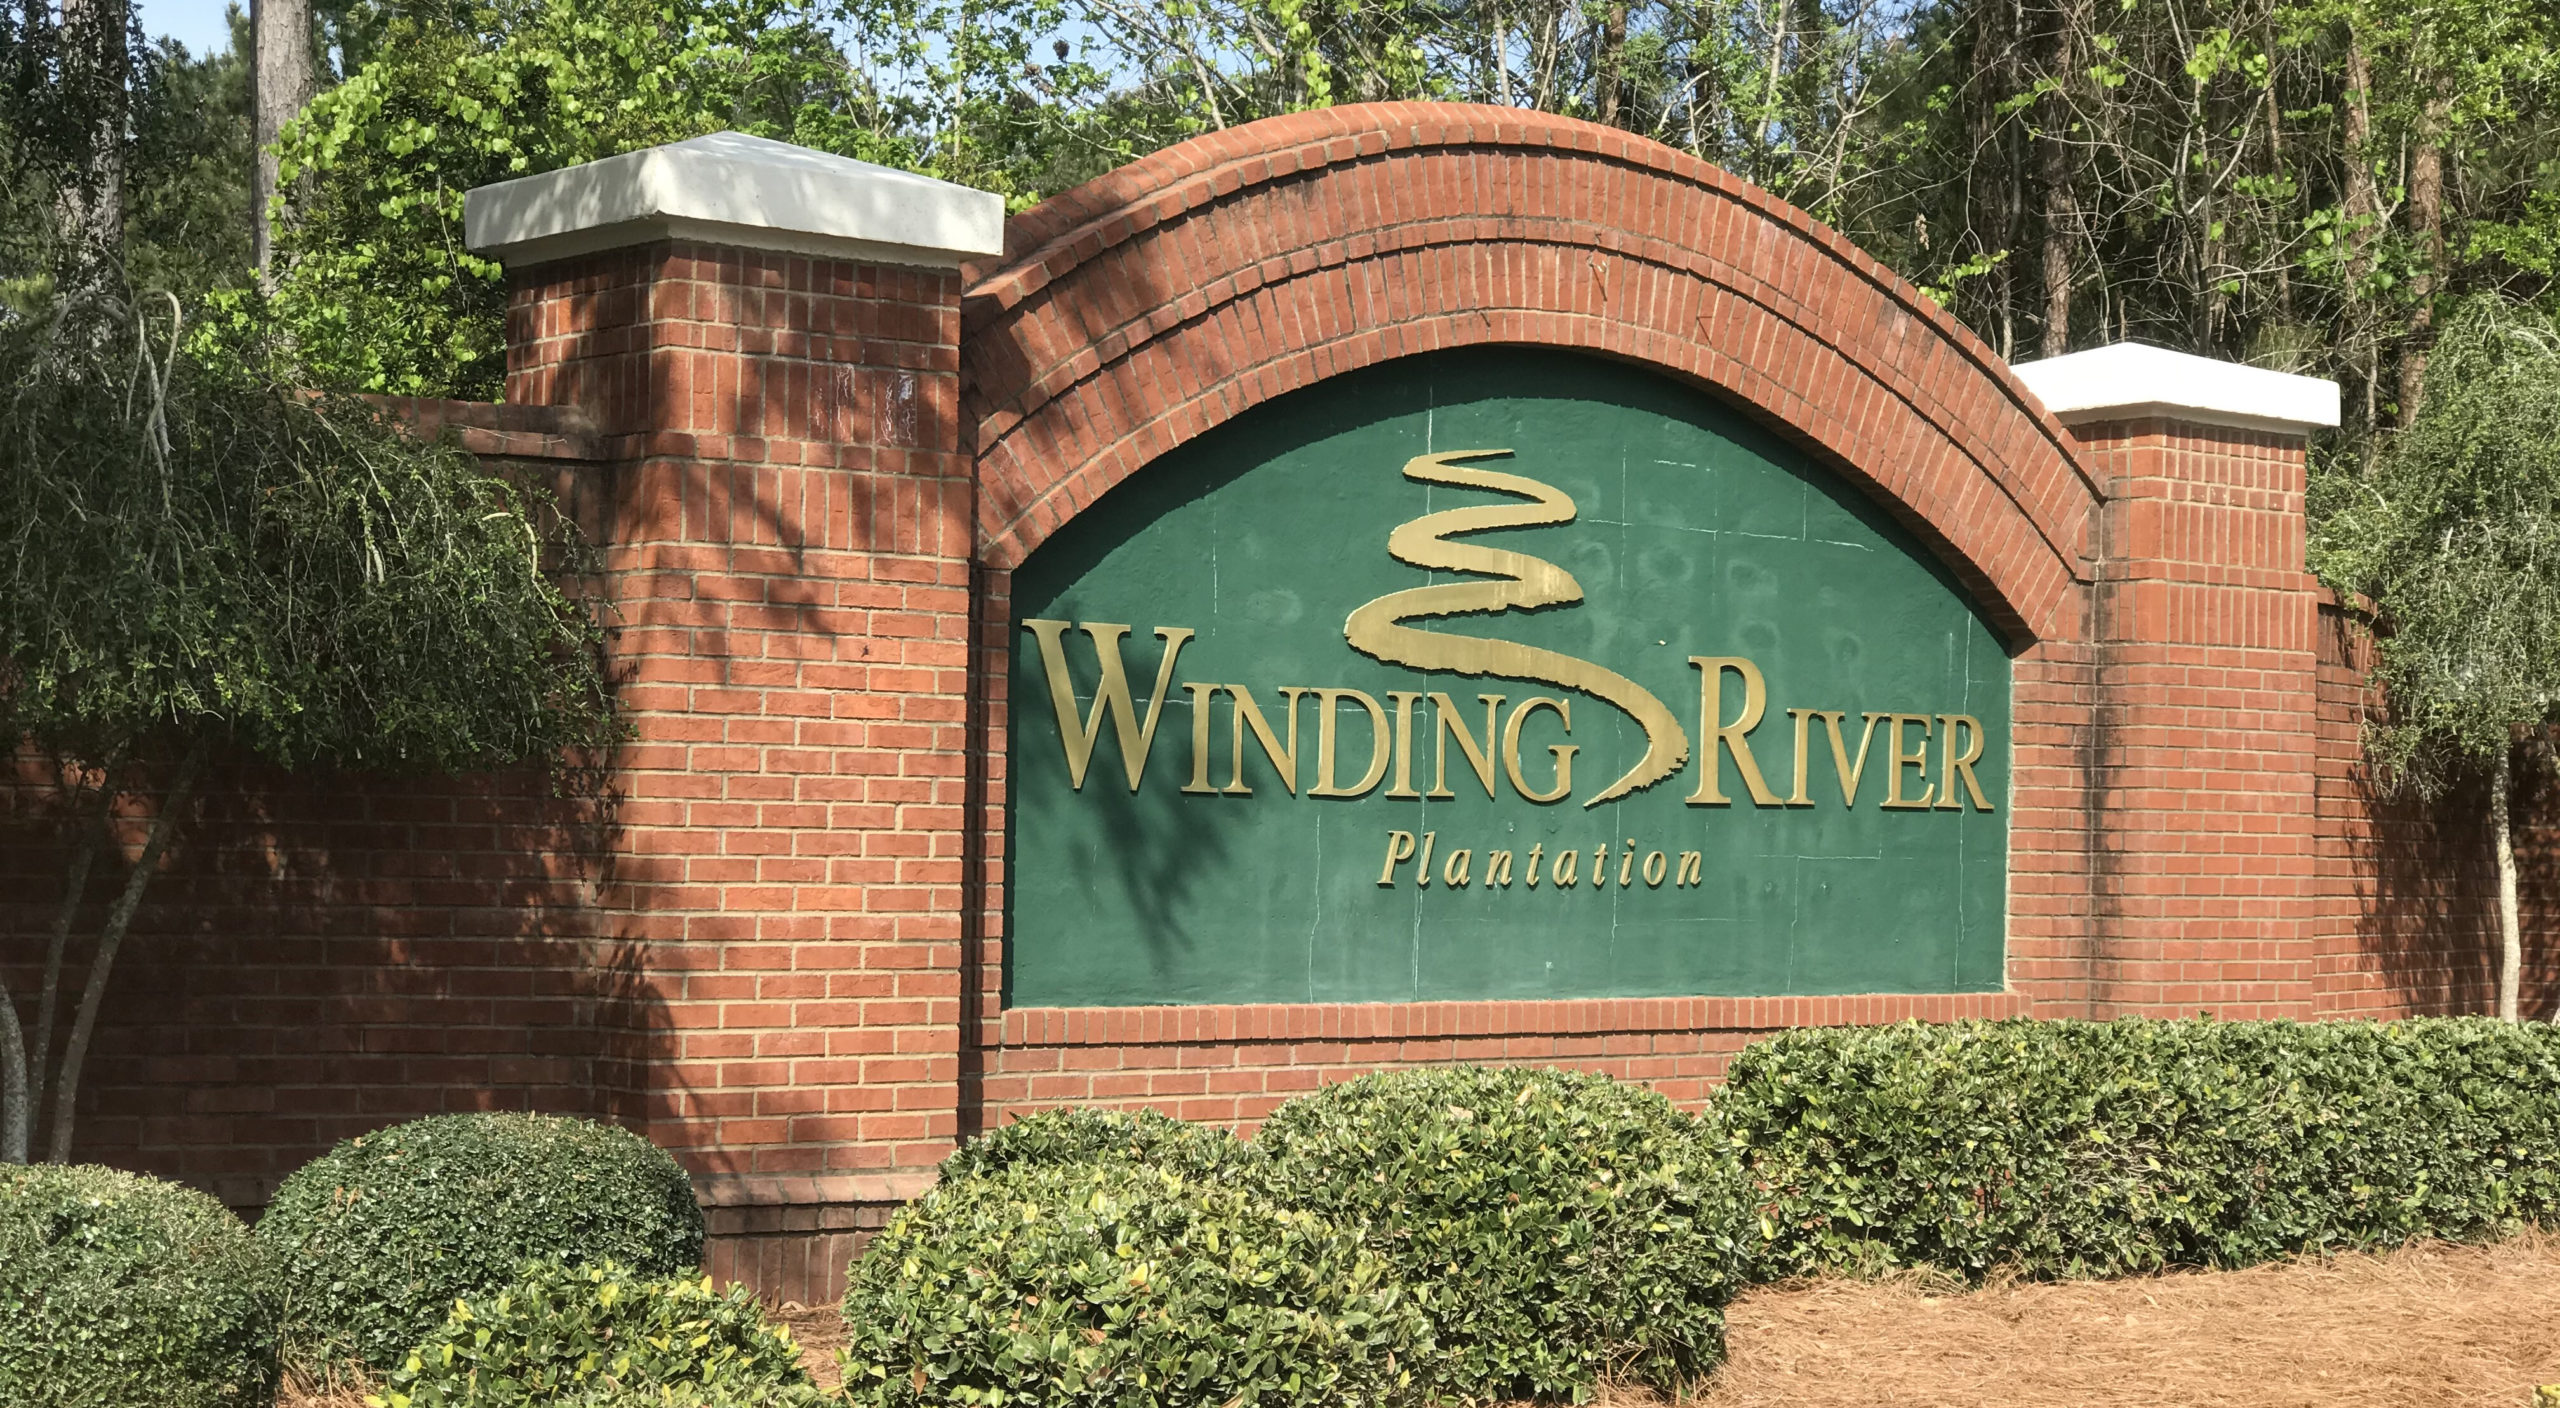 Winding River Plantation